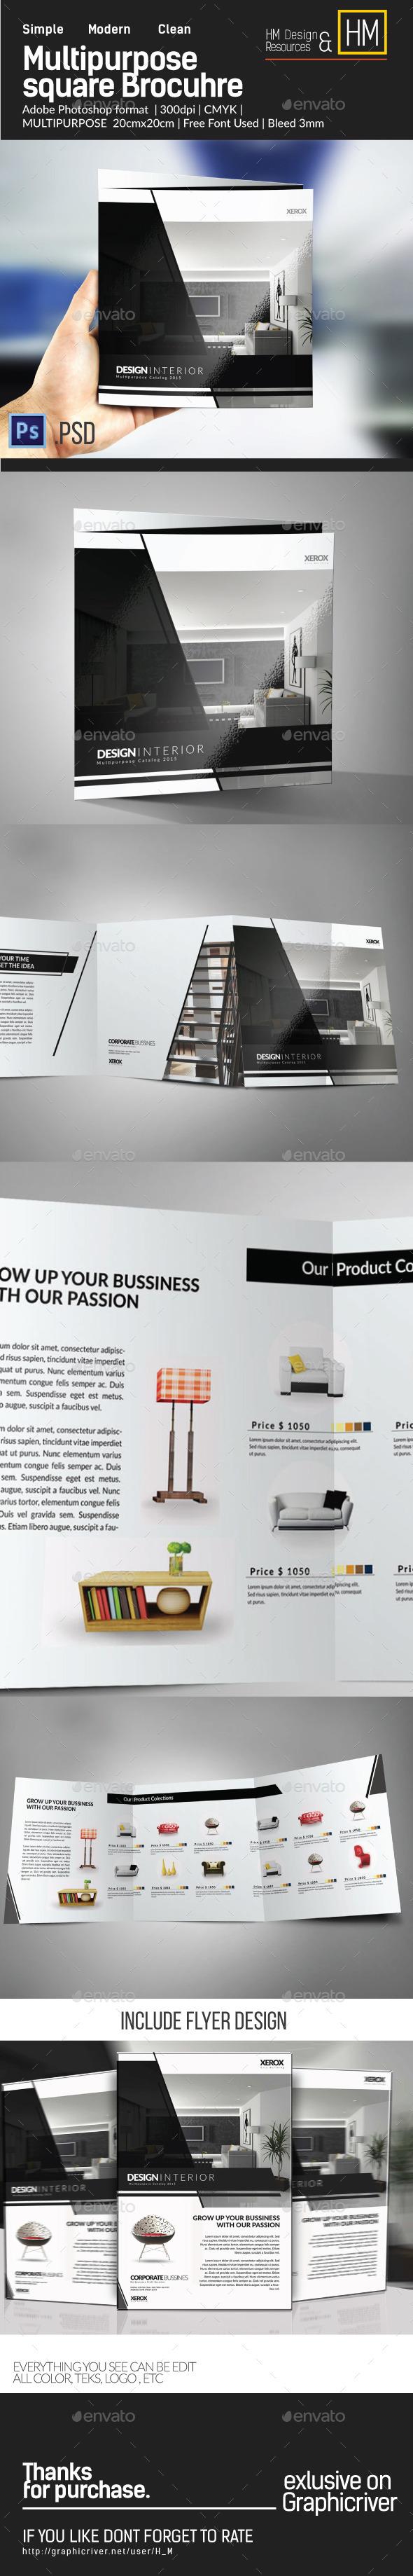 Square Modern Multipurpose Brochure Trifold - Brochures Print Templates